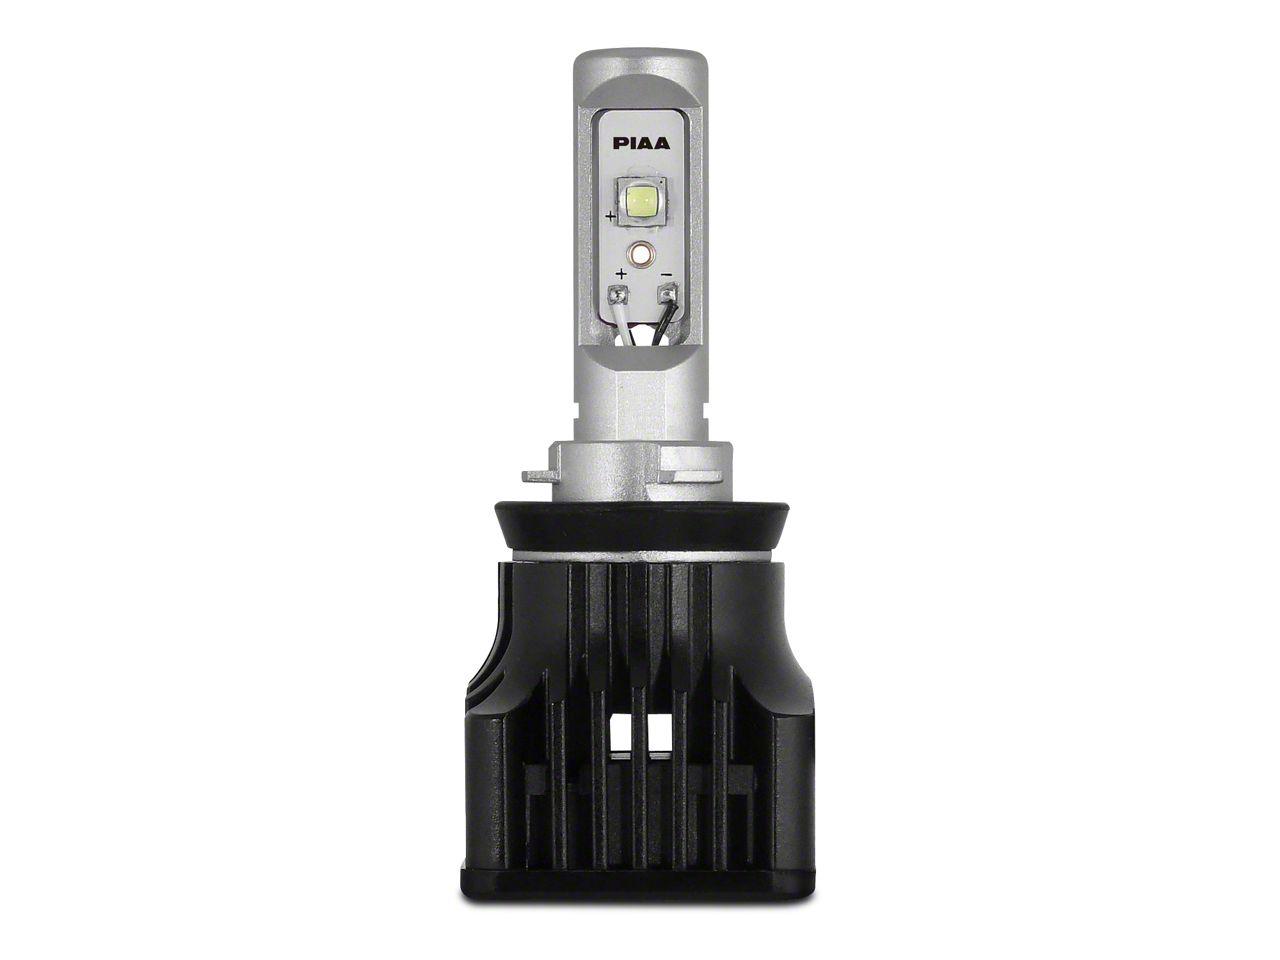 PIAA High Output White LED High Beam Bulb - 9005 (15-18 F-150 w/ Halogen Headlights)